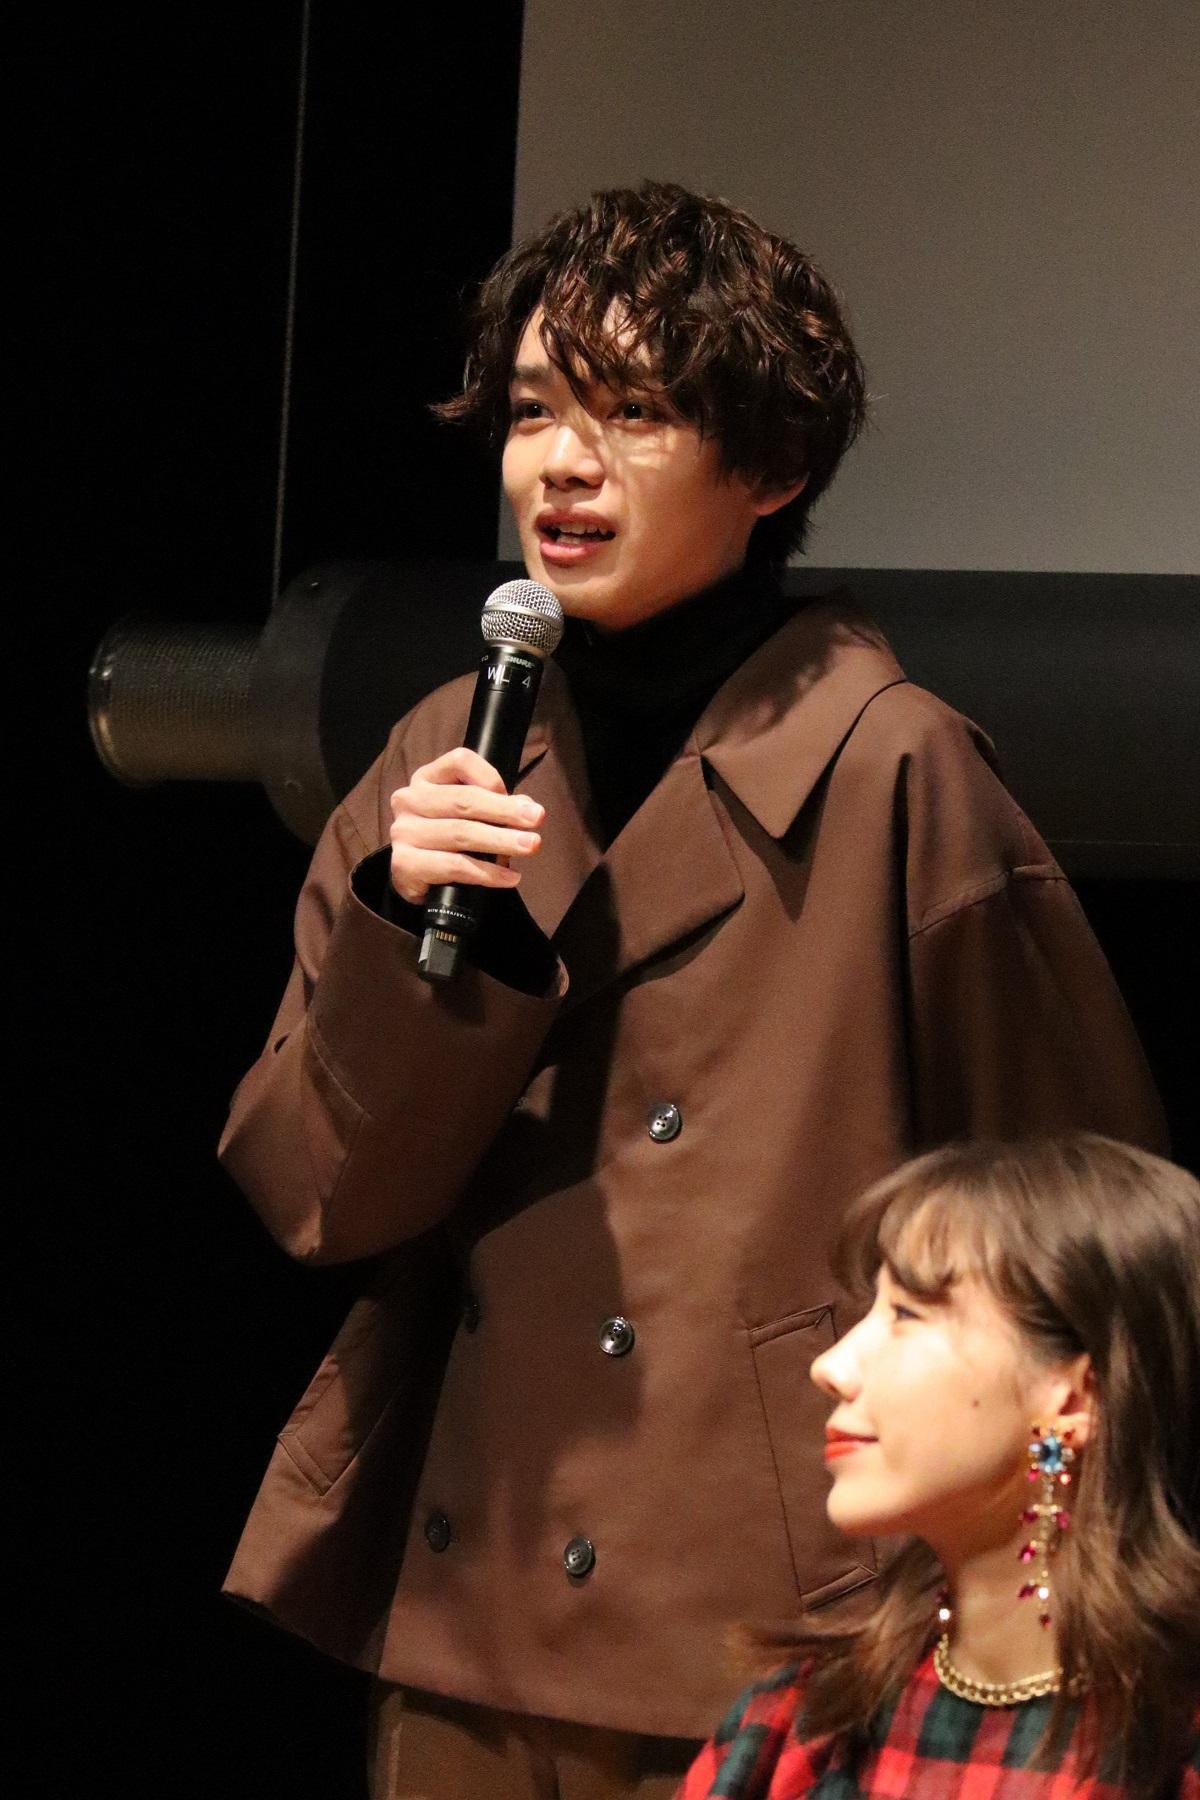 20201017_koihaha_06.JPG